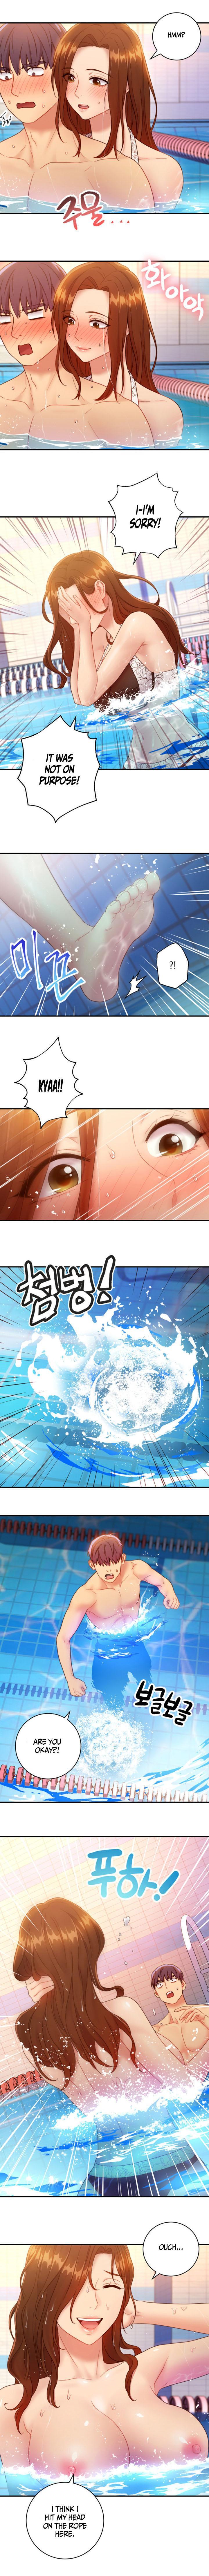 [Neck Pilllow] Stepmother Friends Ch.40/? [English] [Hentai Universe] NEW! 22/10/2020 315